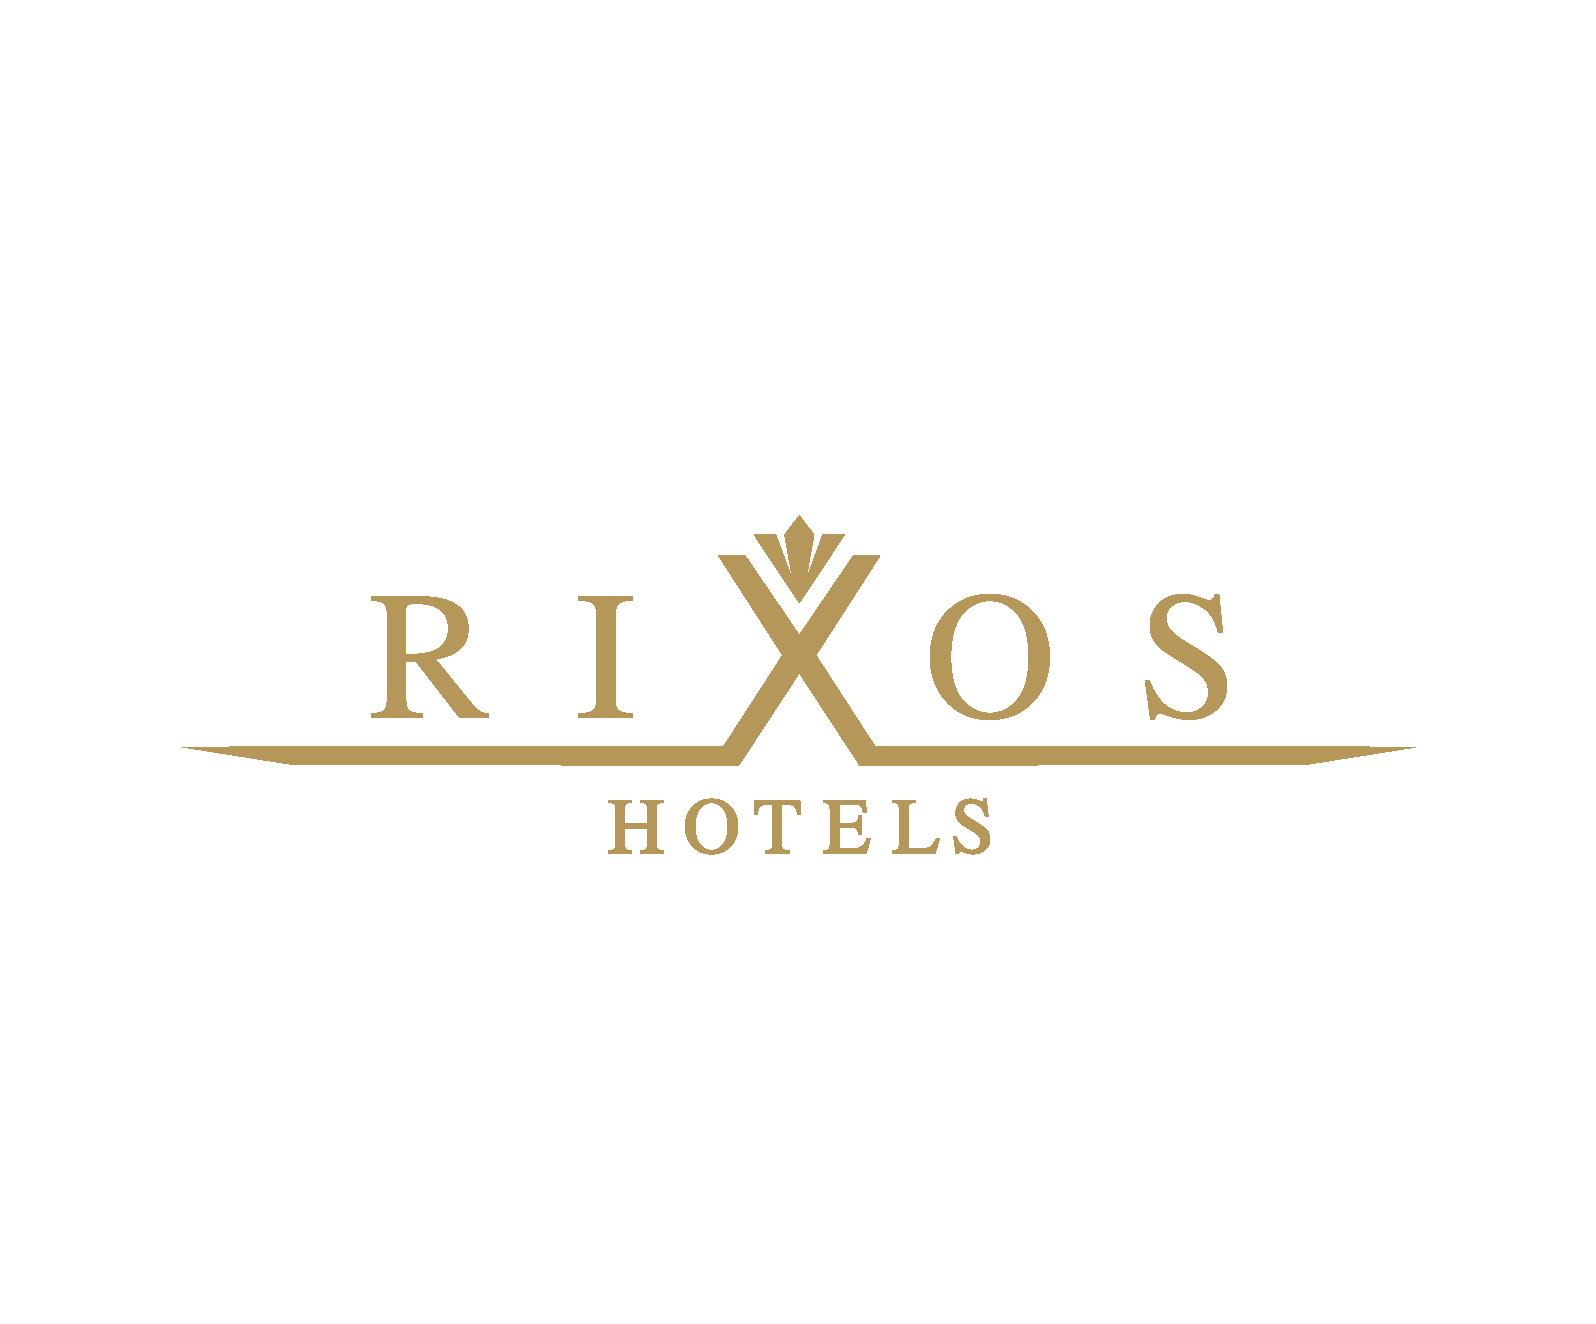 rixos logo